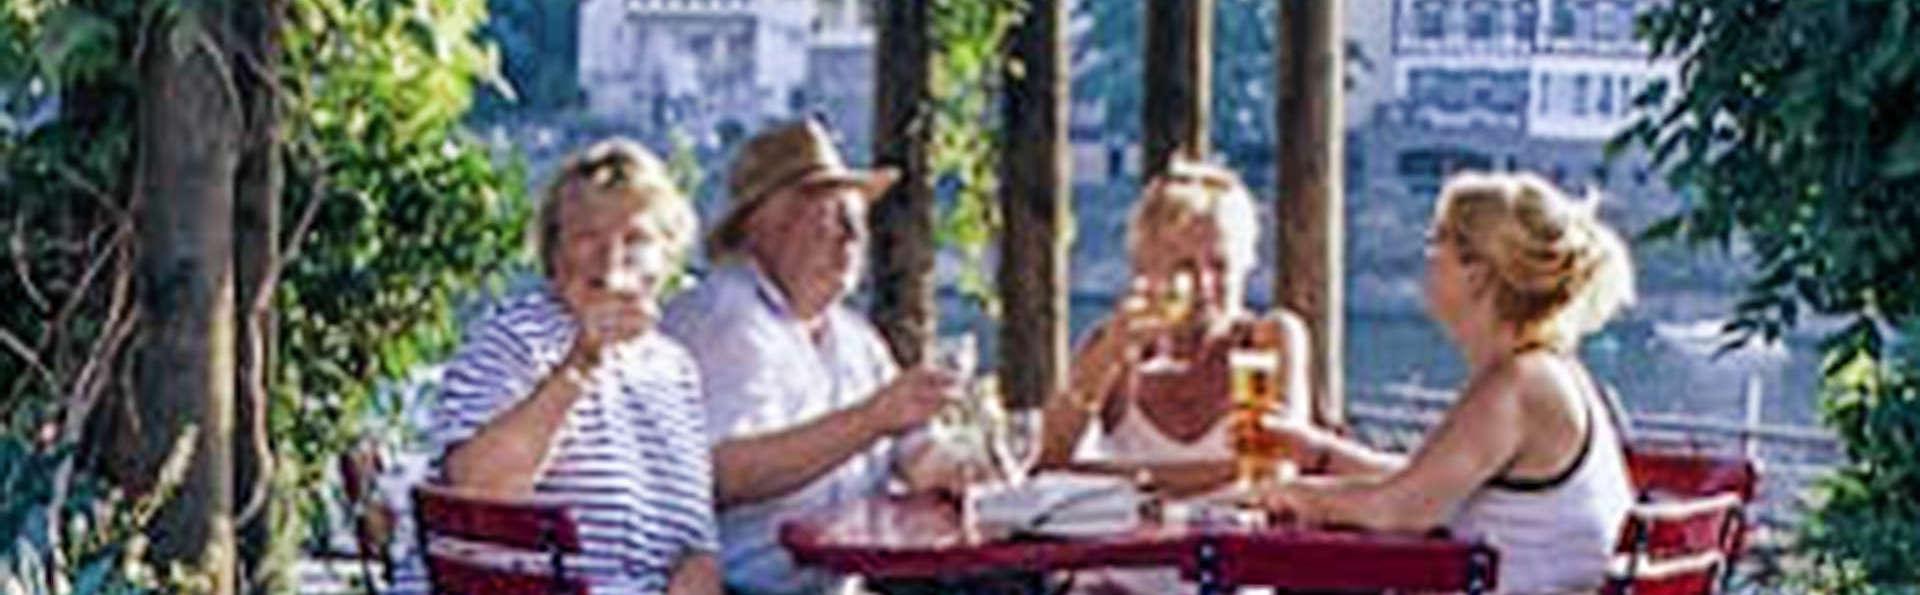 Moselstern**** Hotel Brixiade & Triton - EDIT_Biergarten_Burgsicht_Brixiade_klein_01.jpg